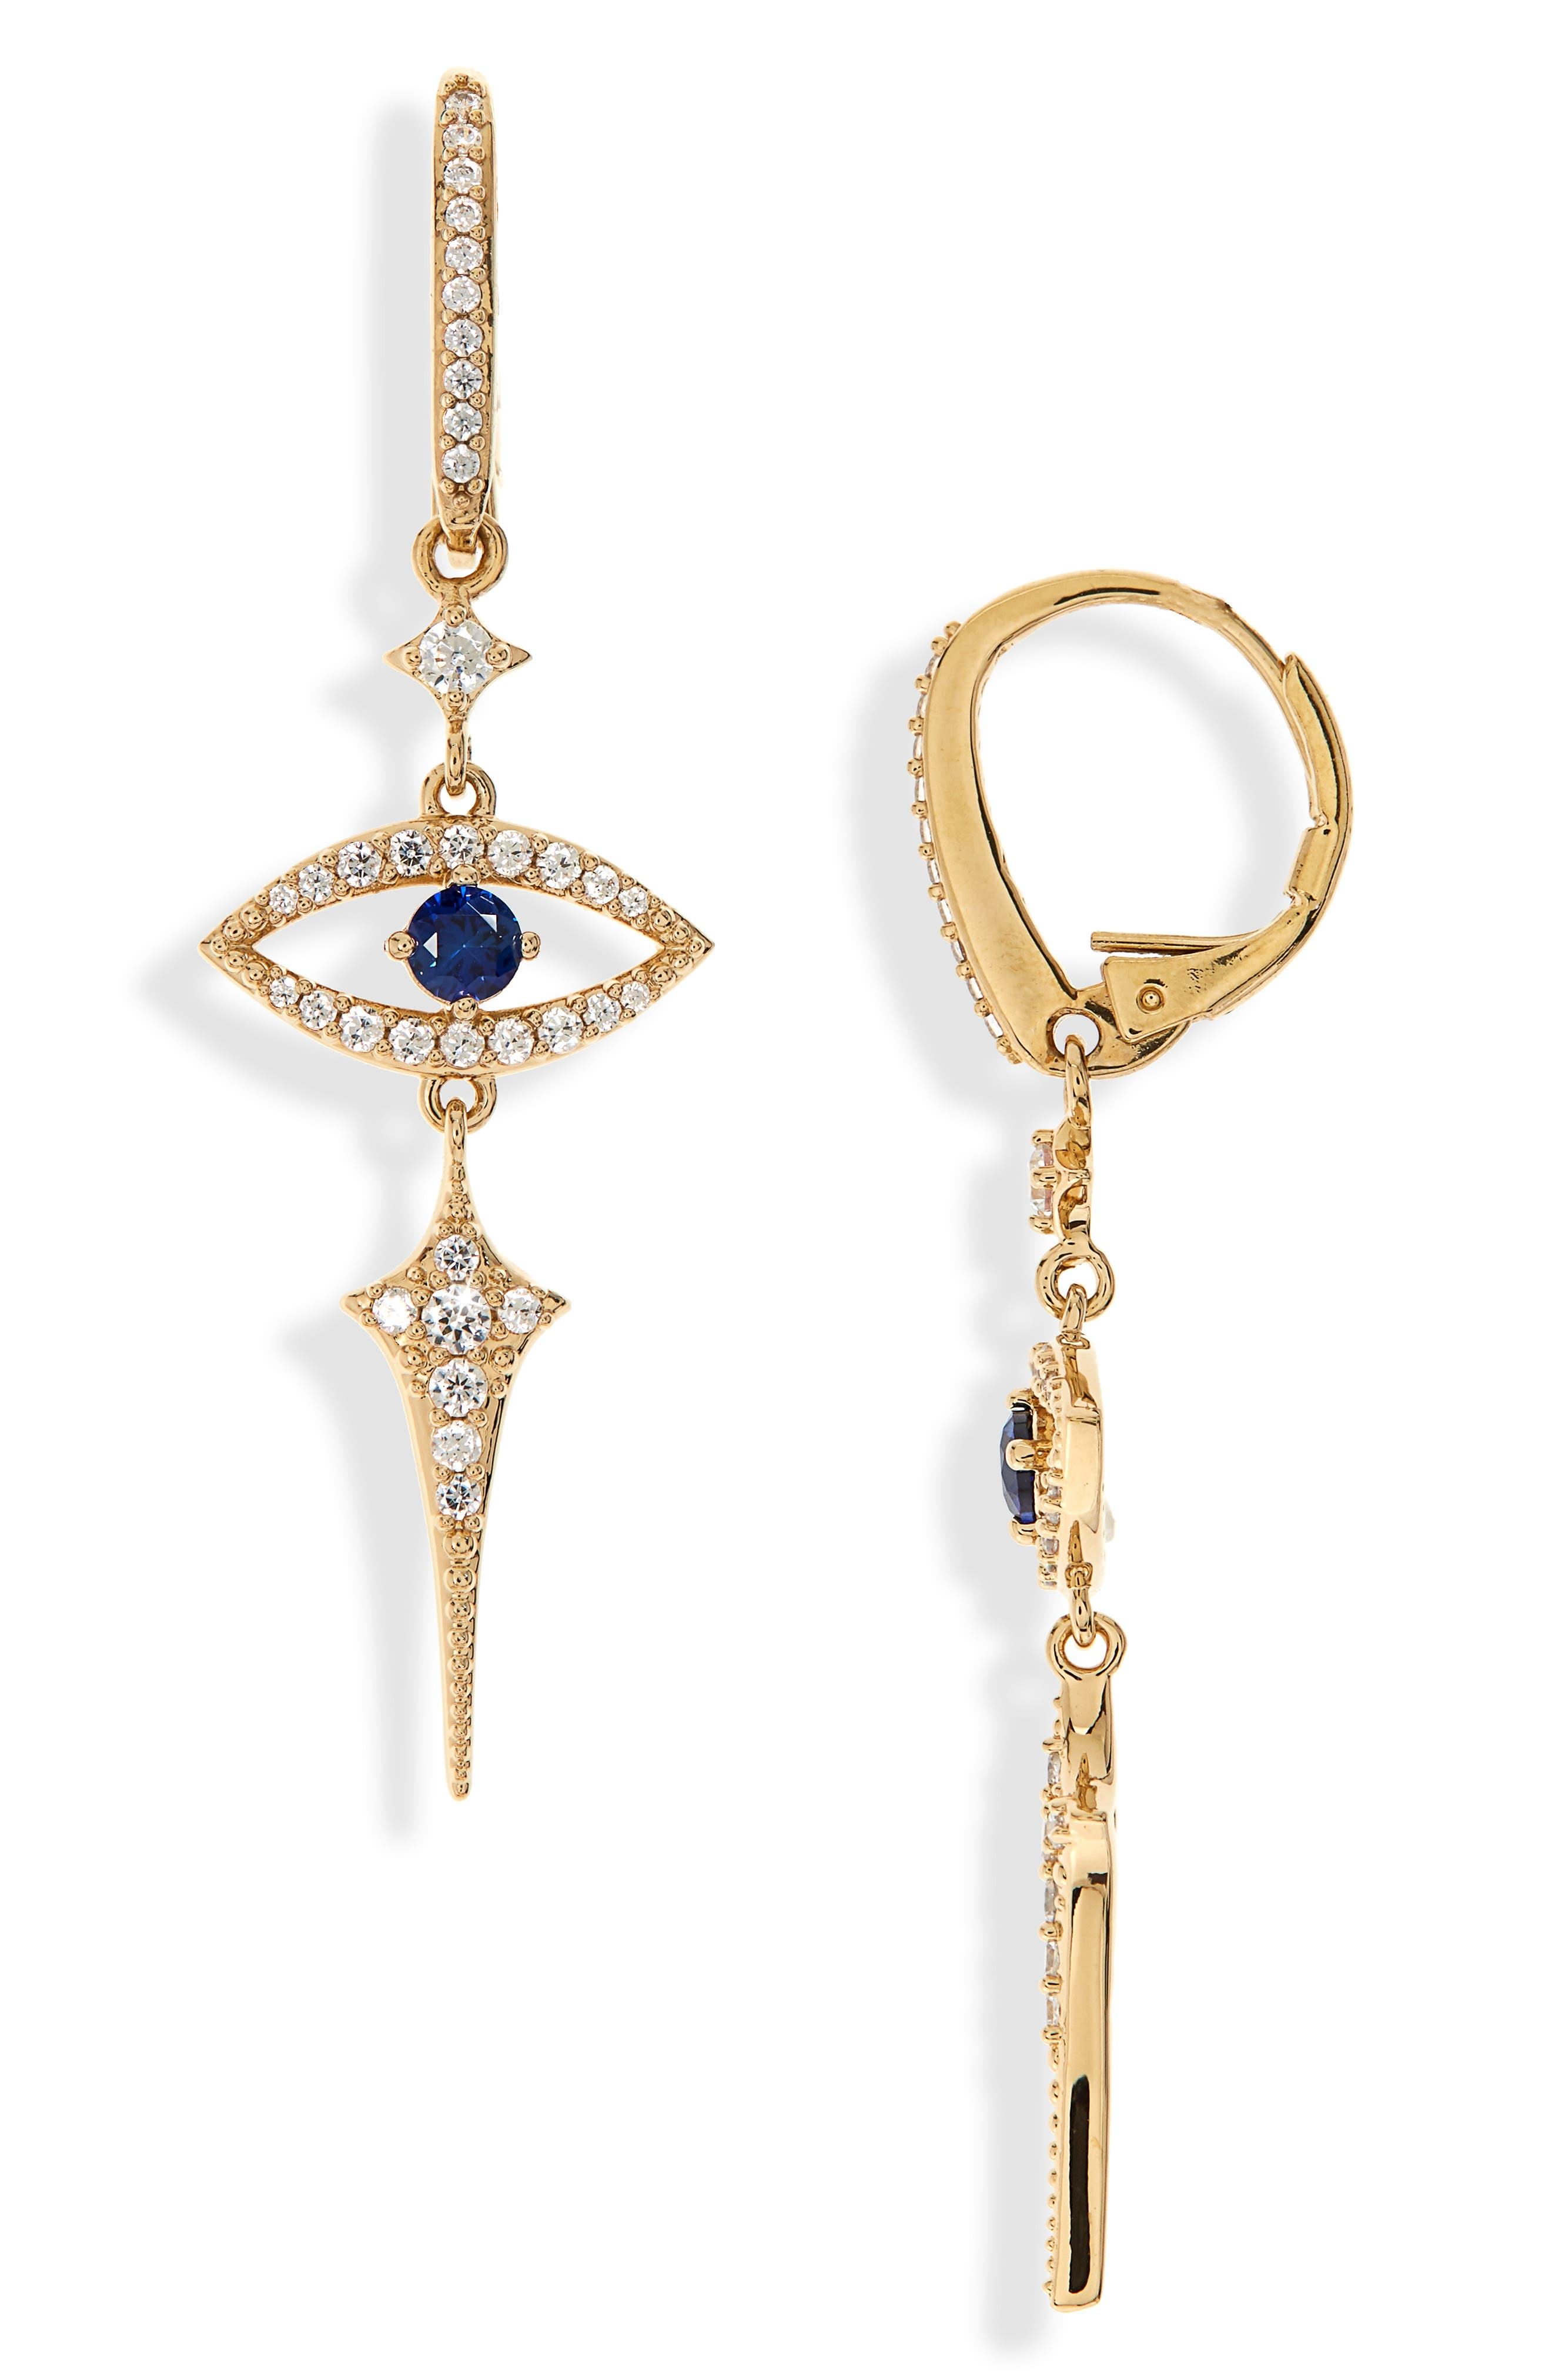 Nazar Evil Eye Earrings,                             Main thumbnail 1, color,                             Gold